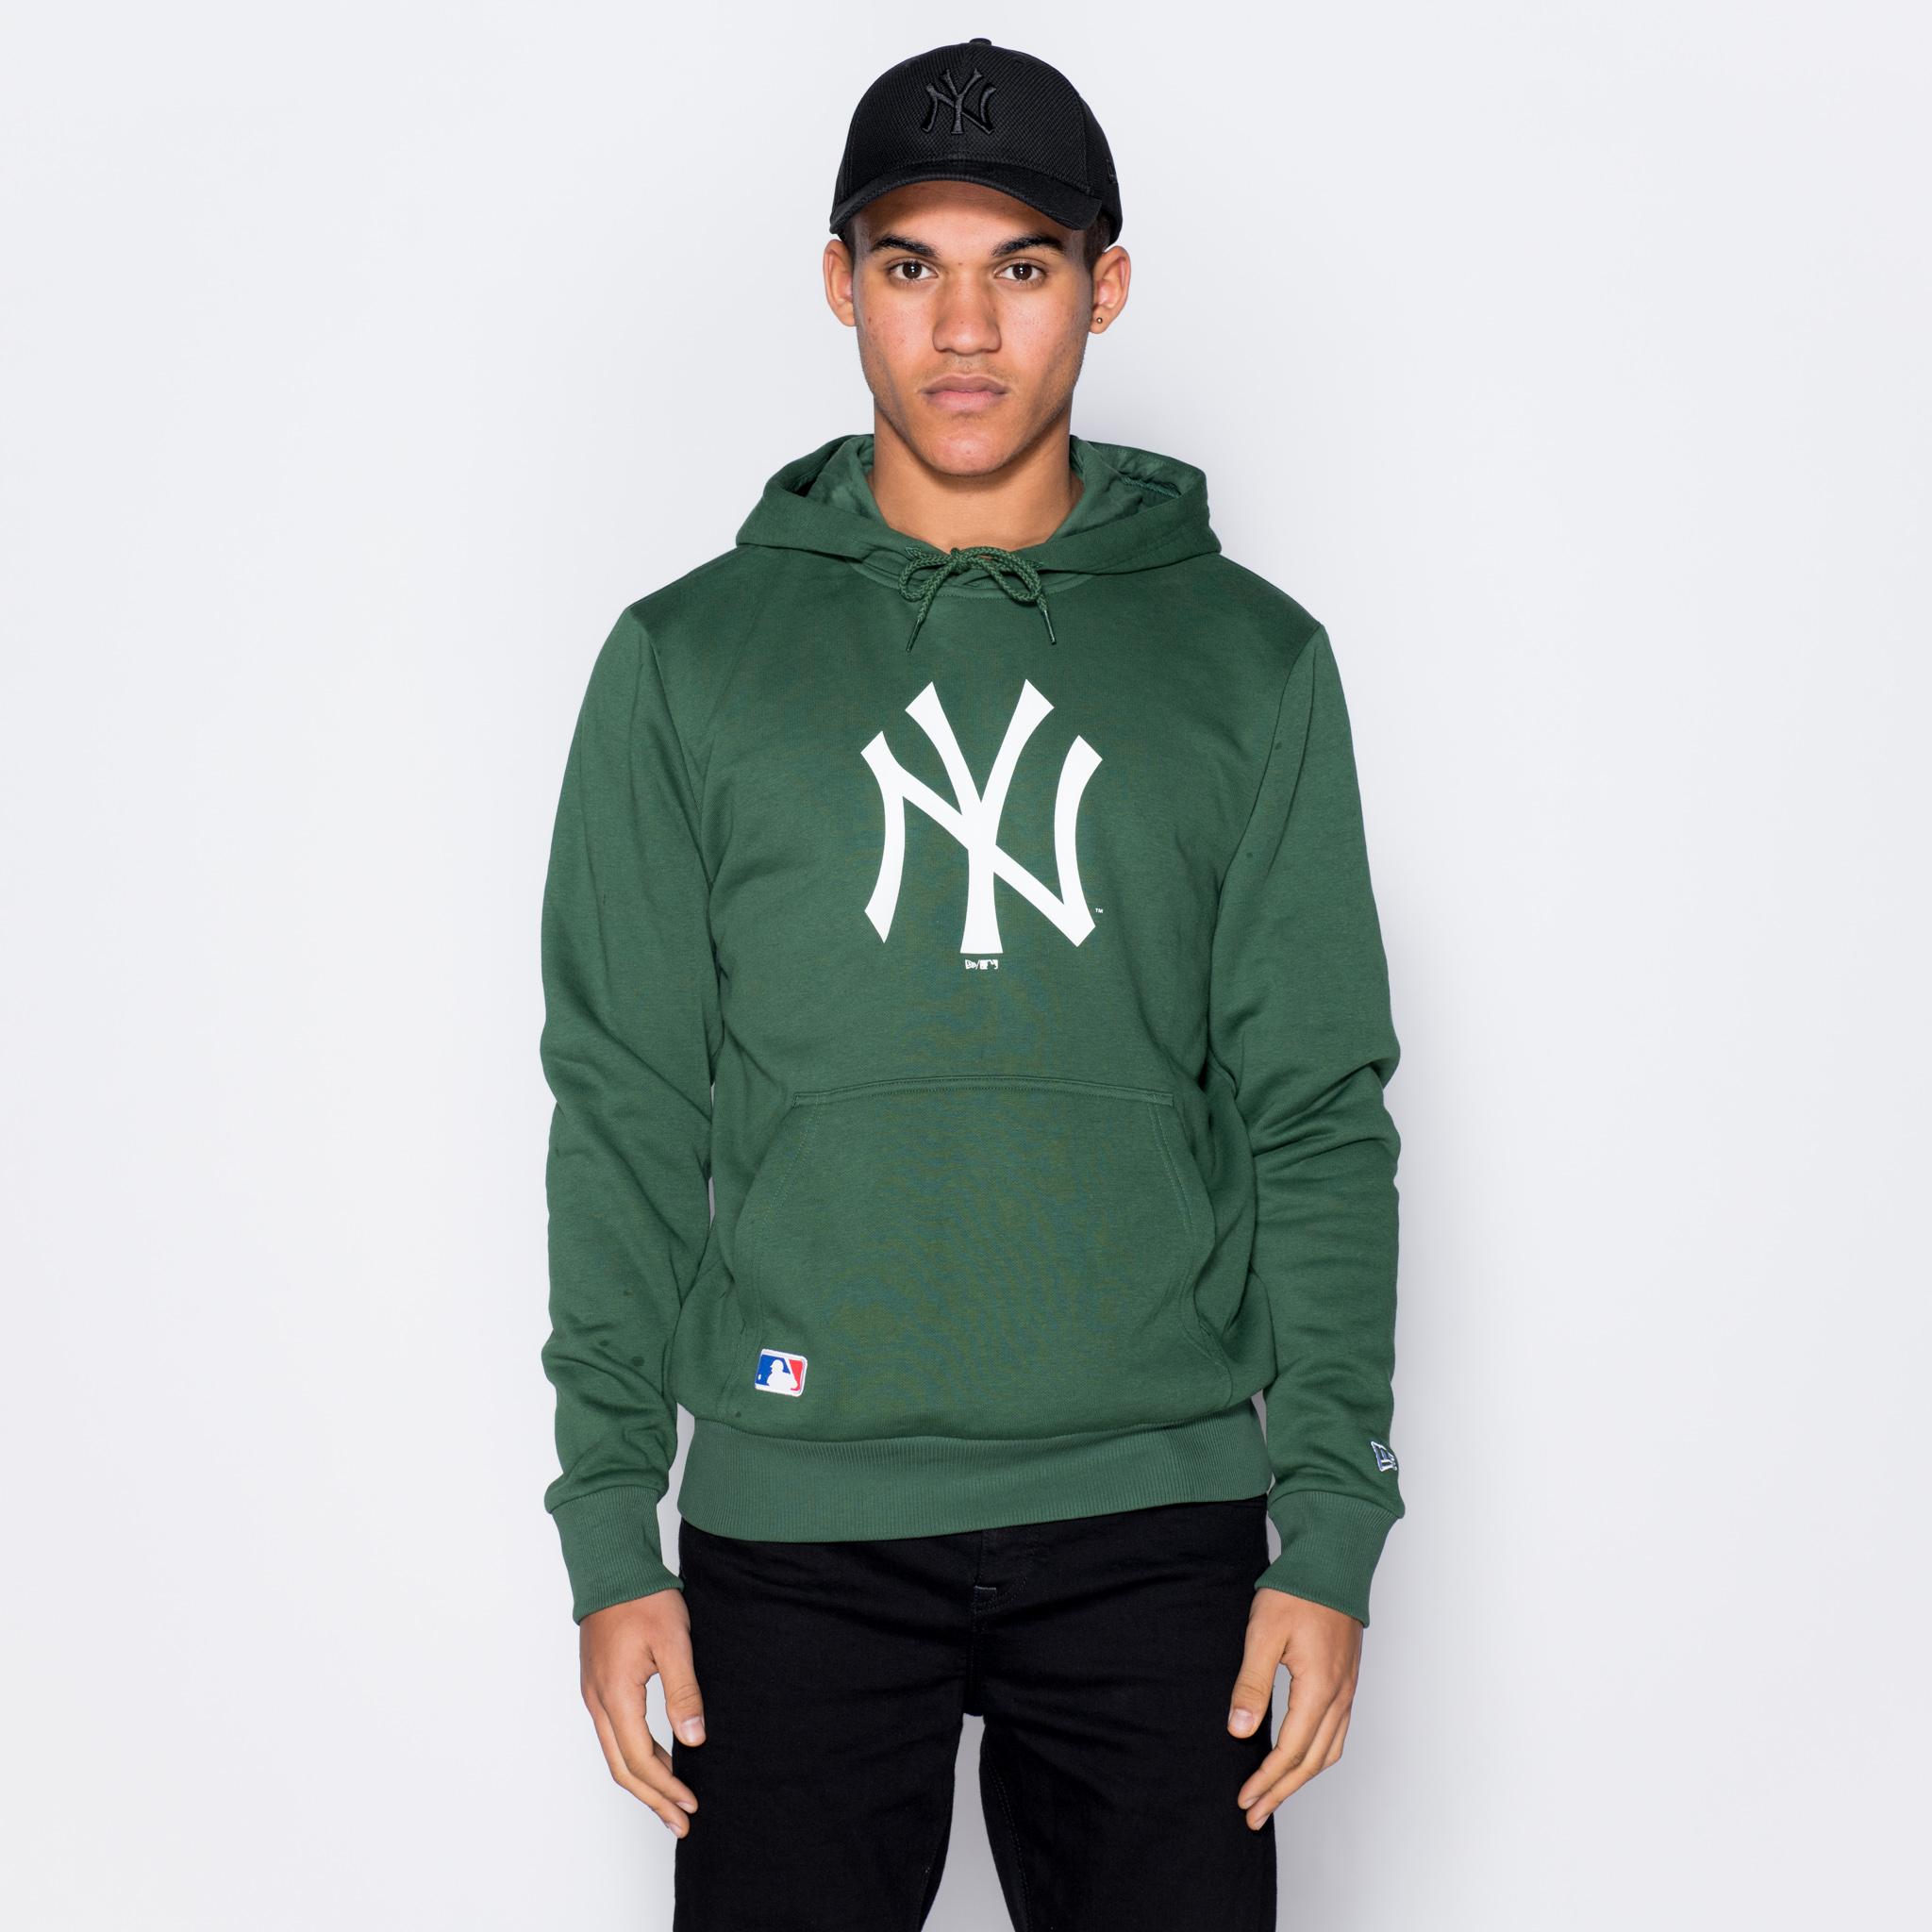 Sweat à capuche des New York Yankees vert avec logo